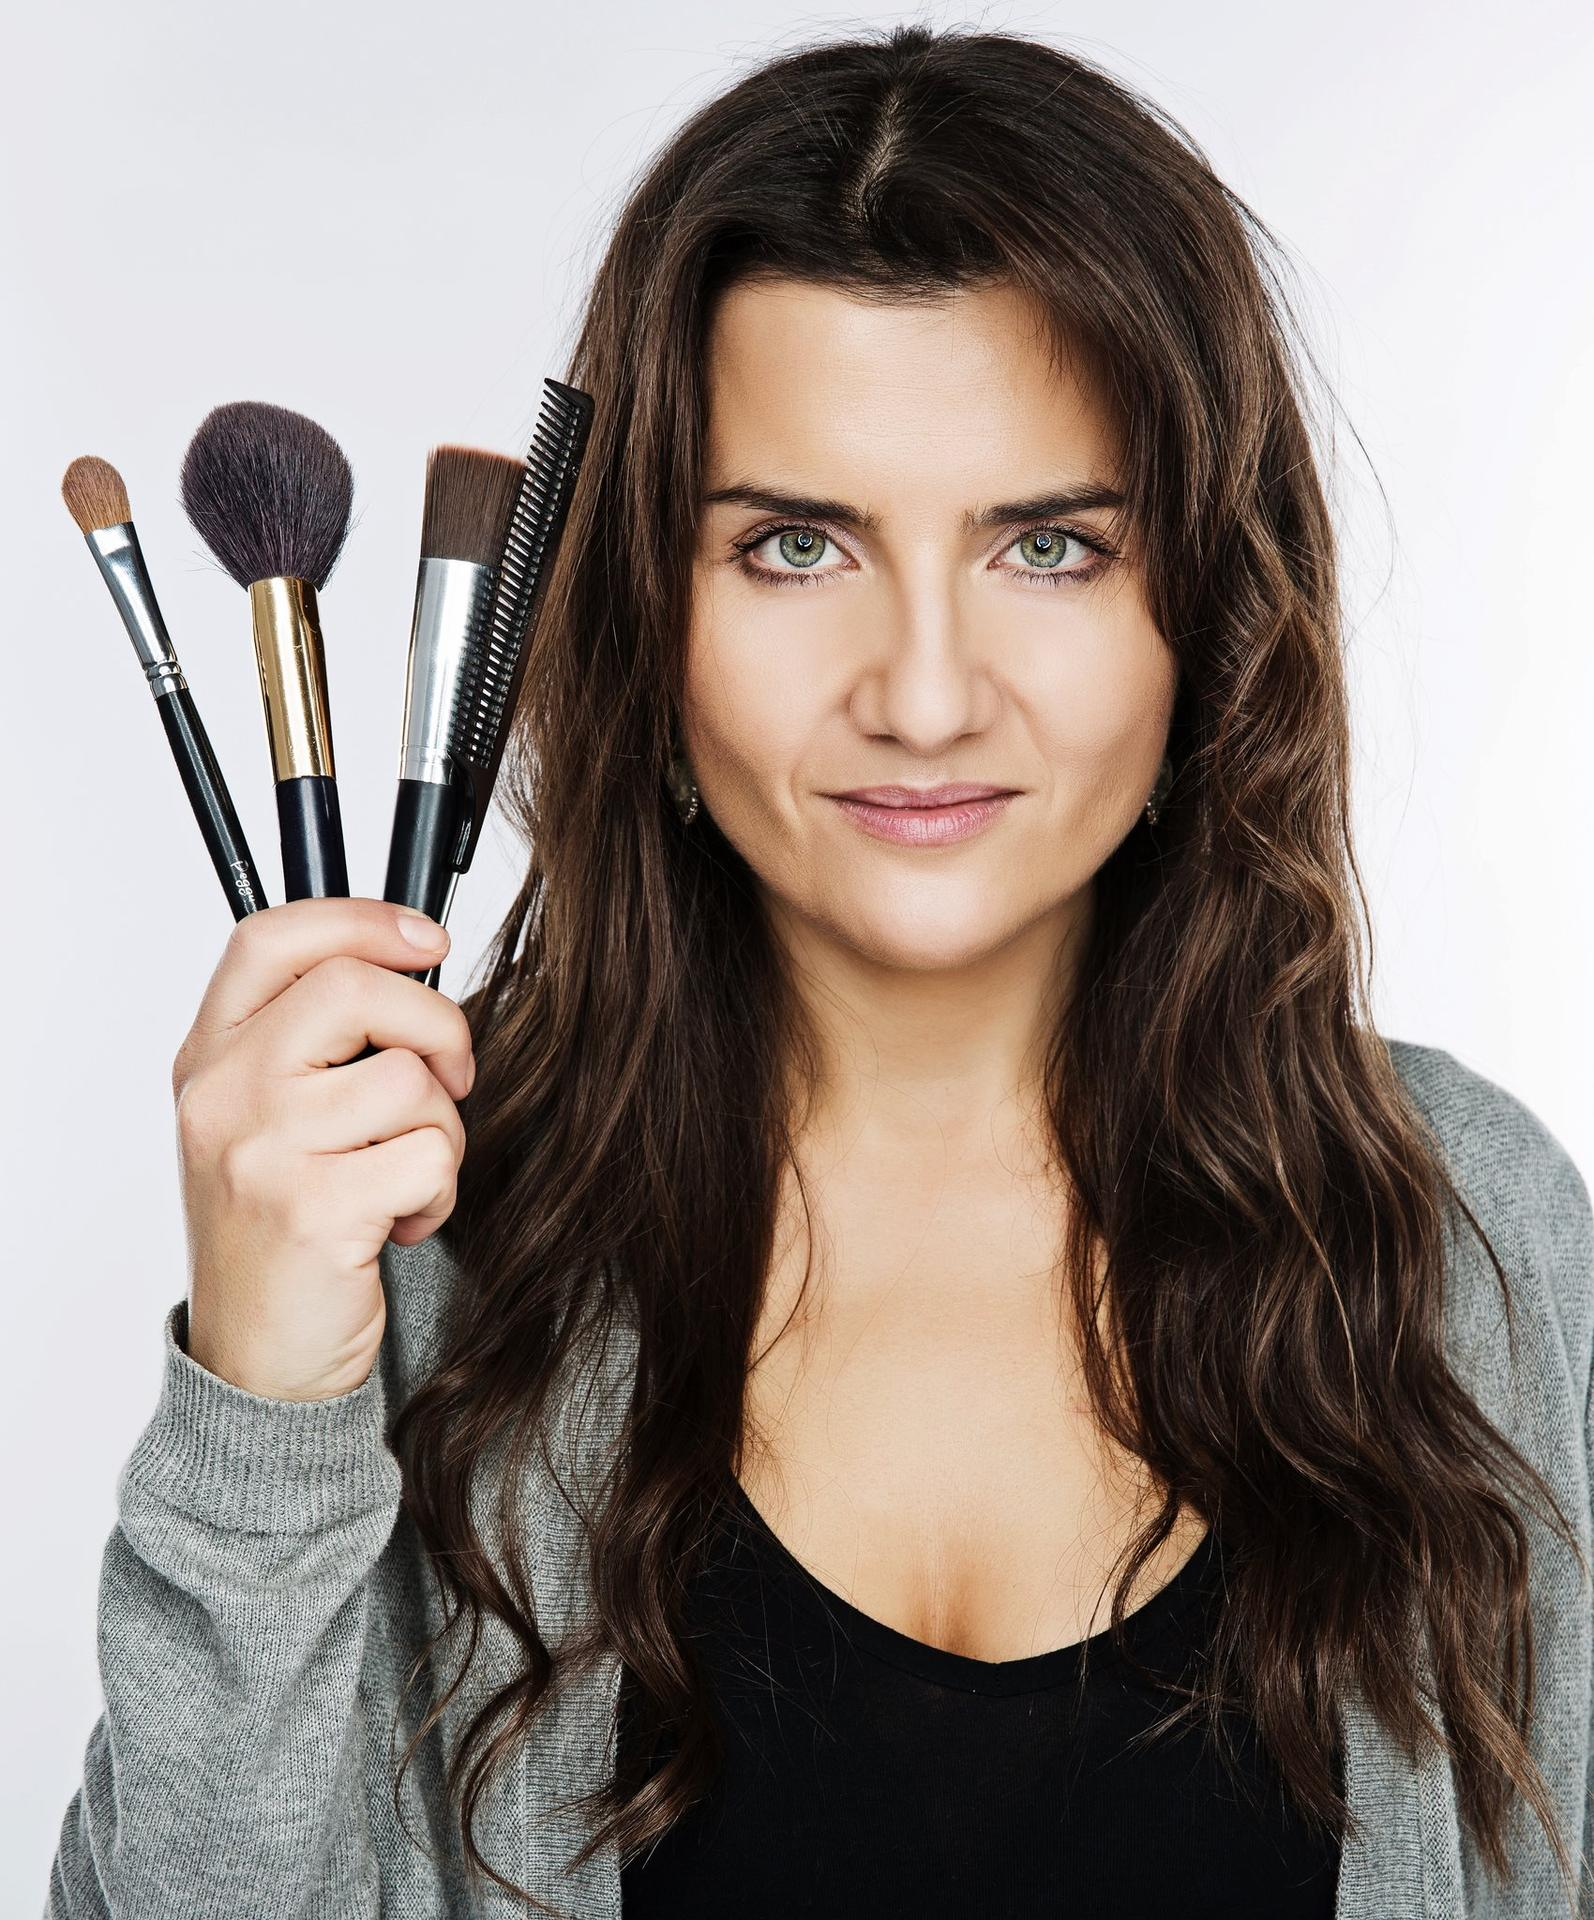 ❤️K&P❤️ Prípravy na náš deň 🥰 - Make up & vlasy - Eliška Pichoňská  https://www.elimakeupartistblog.com/